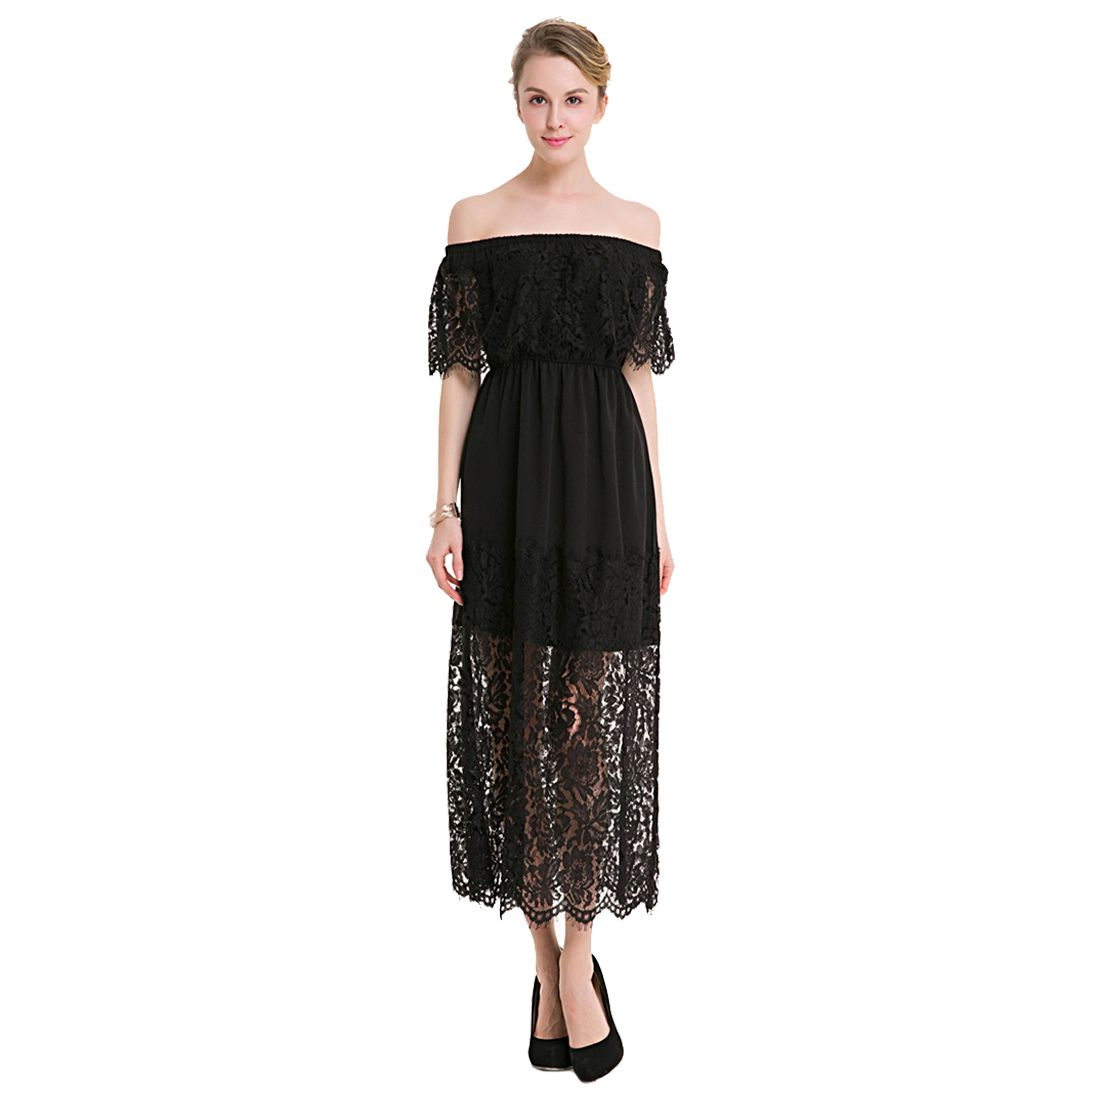 TFGS Women Original Design Lace Slash Neck Summer Dress Petal Sleeve Elegant Lady Casual Dresses